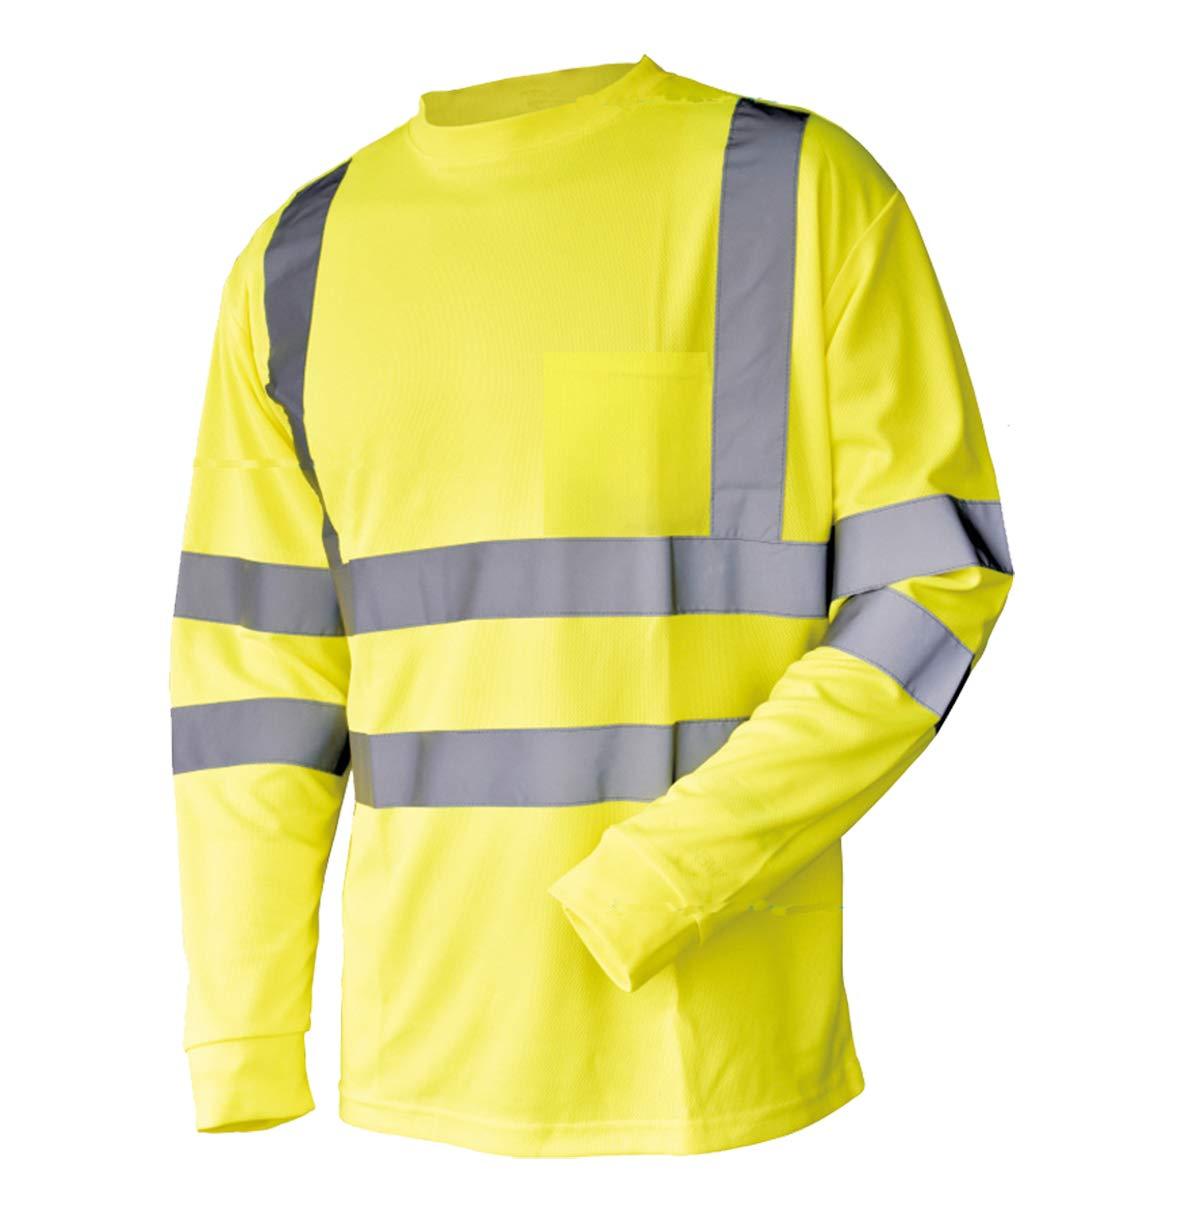 L&M Hi Vis T Shirt ANSI Class 3 Reflective Safety Lime Orange Short Long Sleeve HIGH Visibility (2XL, Lime_L) by L&M